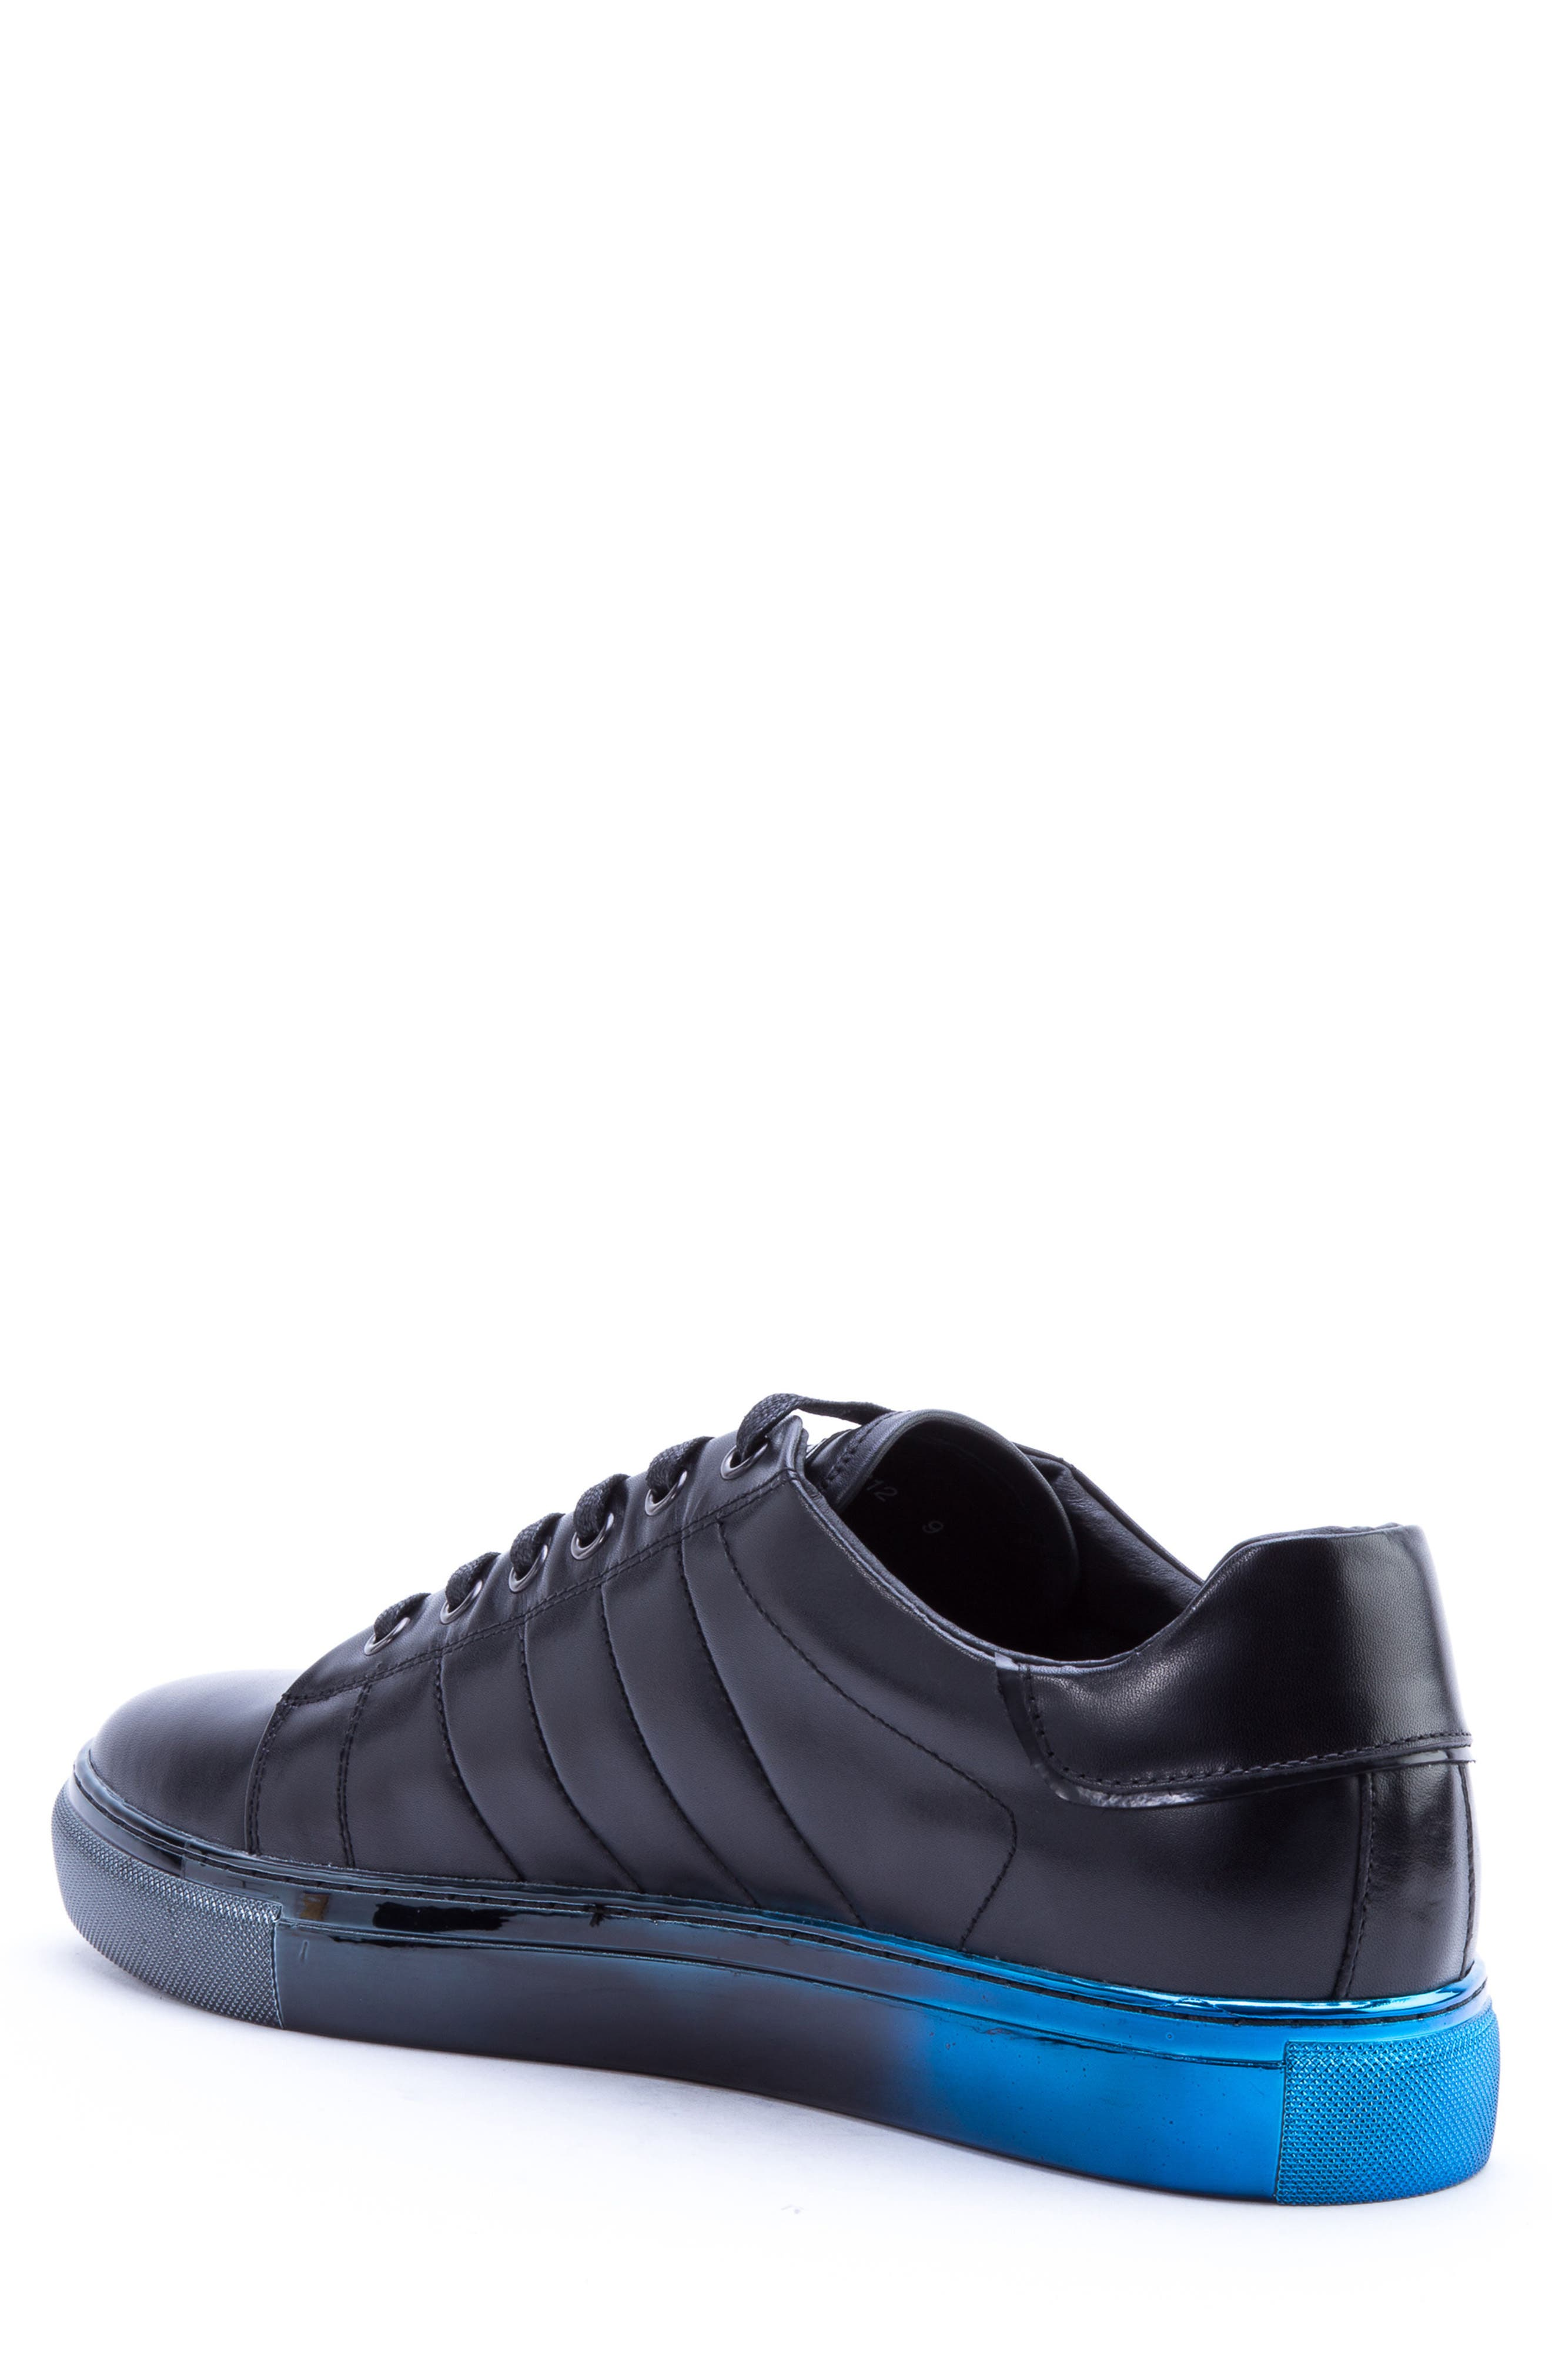 Badgley Mischka Brando Sneaker,                             Alternate thumbnail 2, color,                             BLACK LEATHER